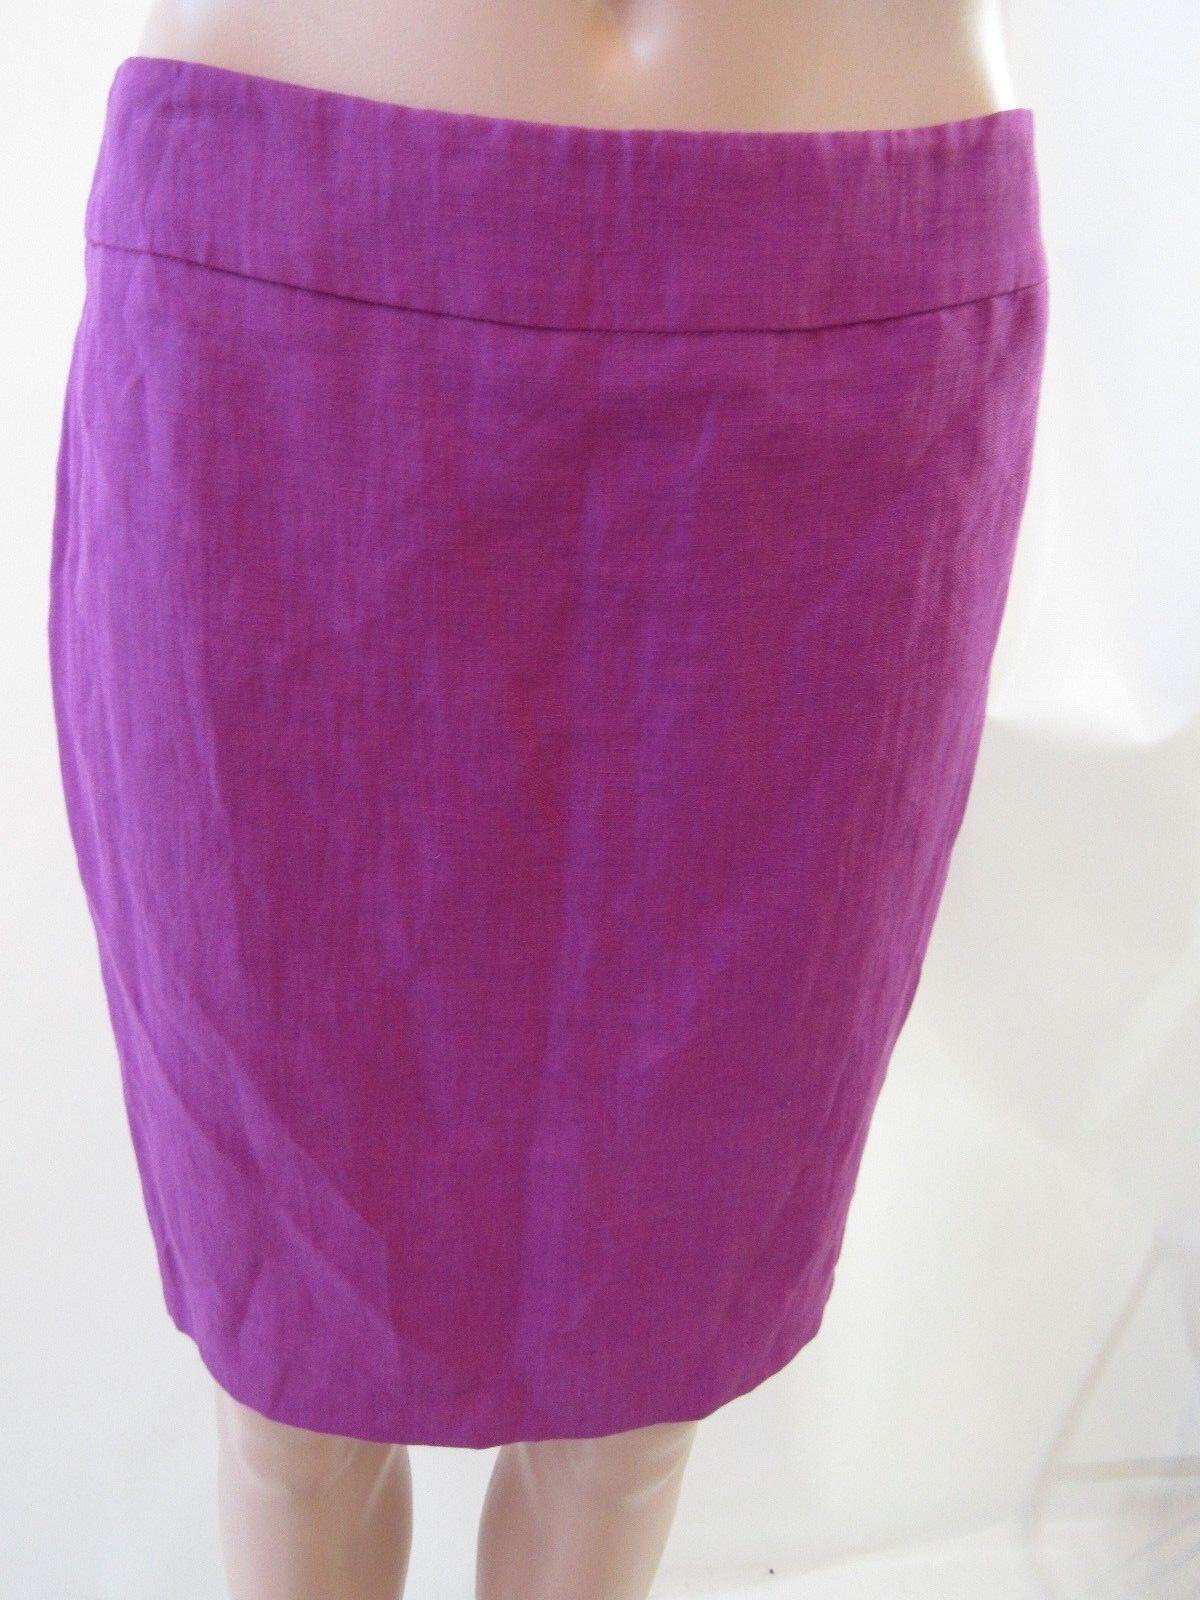 Armani Purple Silk Blend Straight Skirt Size 4